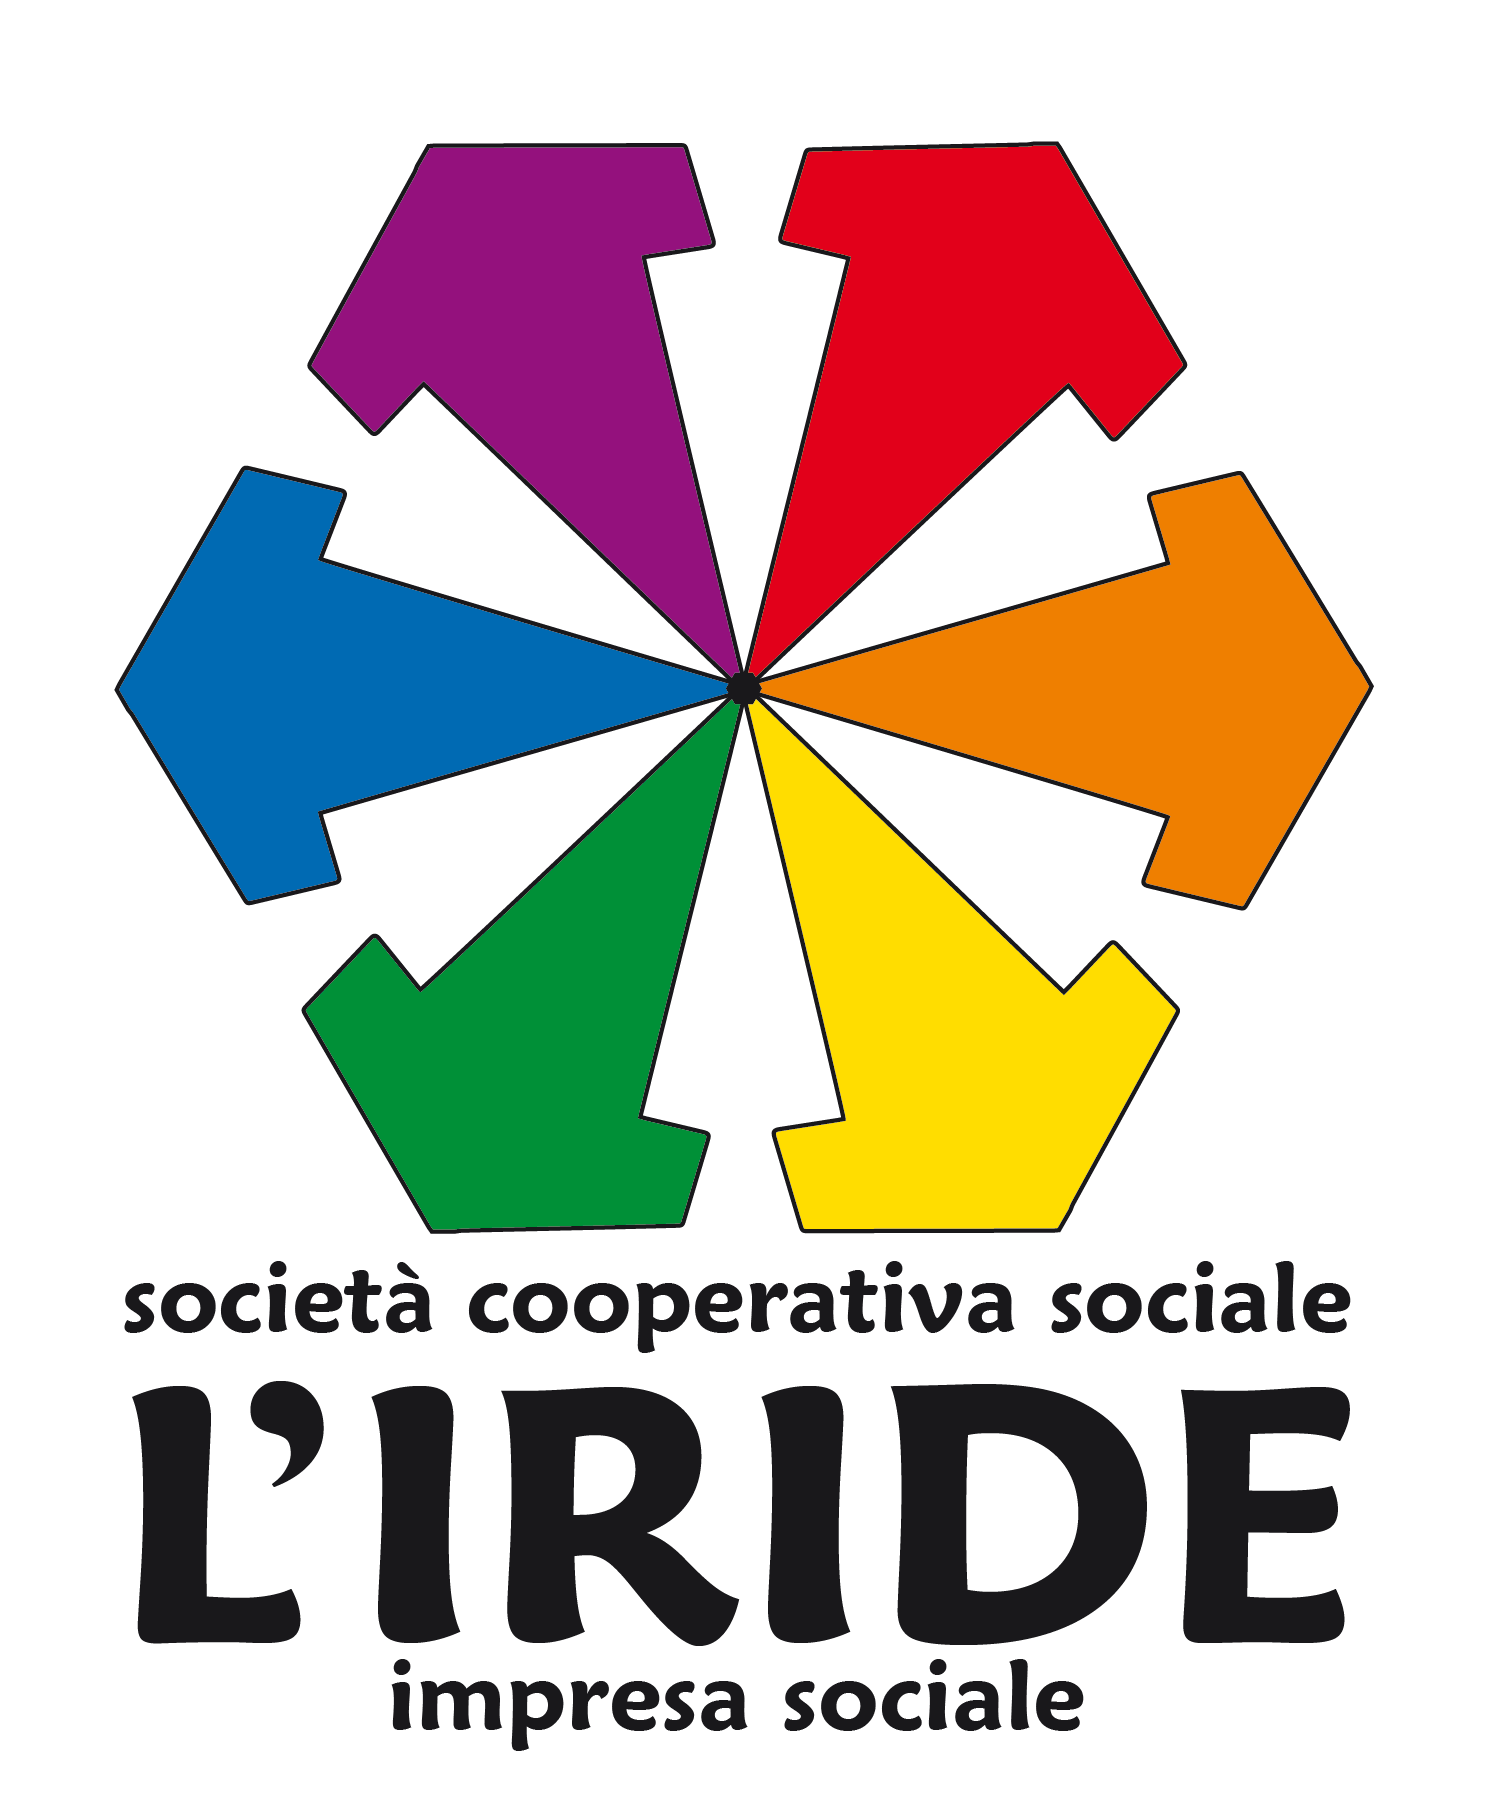 L'IRIDE Società Cooperativa Sociale Impresa Sociale